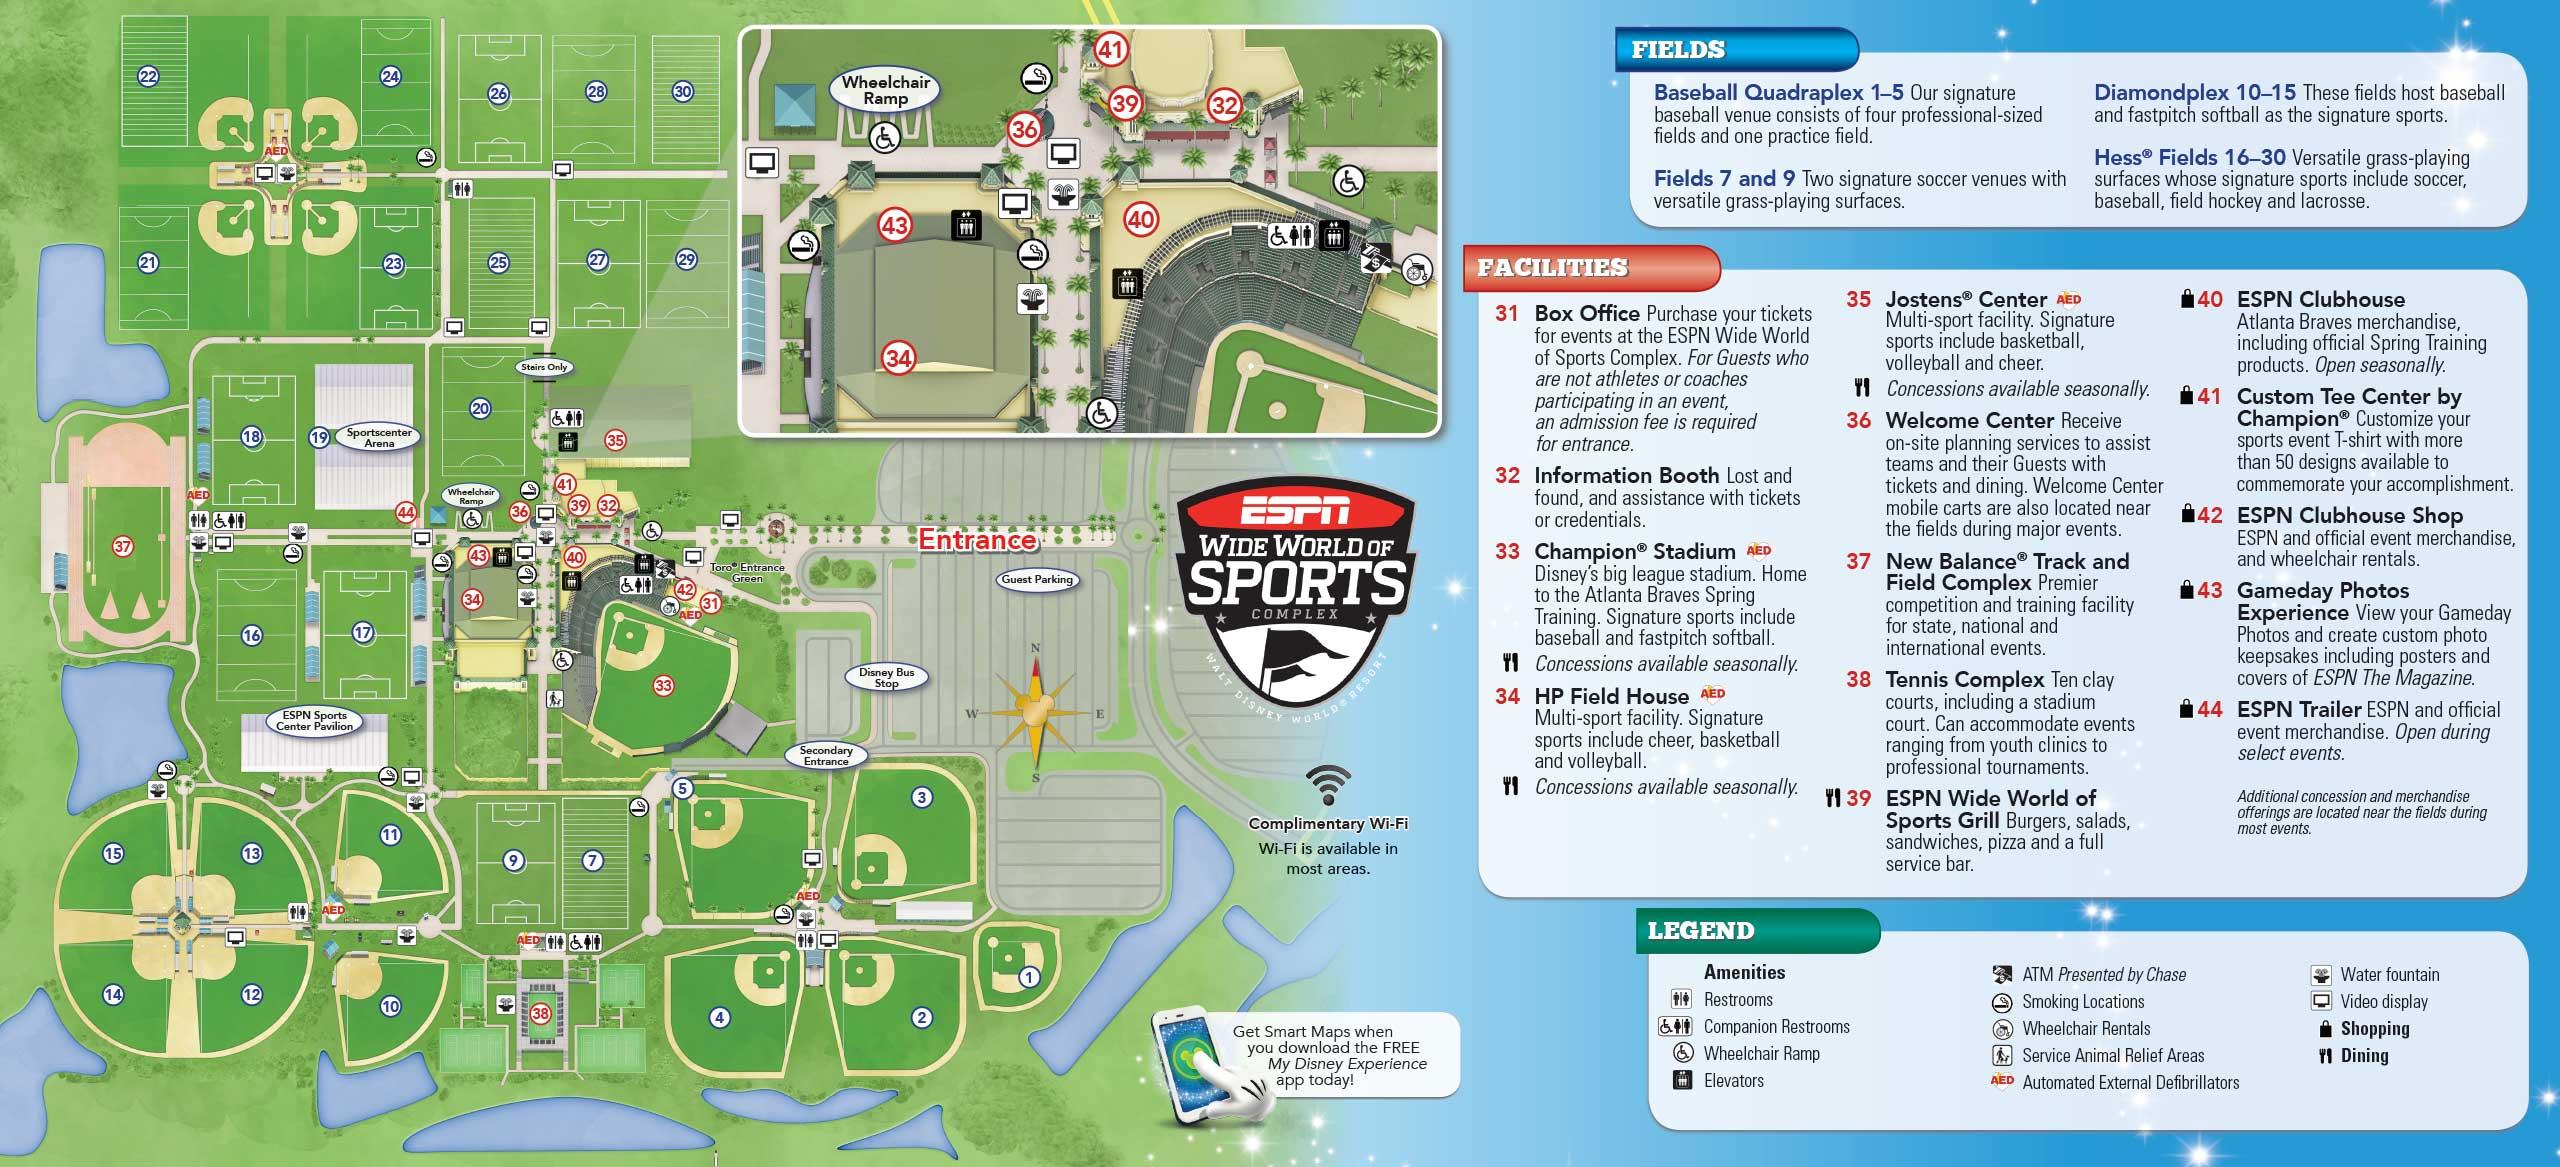 Espn Wide World Of Sports Map May 2016 Walt Disney World Park Maps   Photo 14 of 14 Espn Wide World Of Sports Map